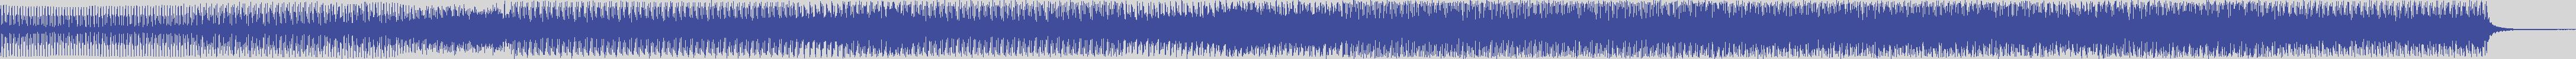 just_digital_records [JS1186] Malden - Revelation [Original Mix] audio wave form